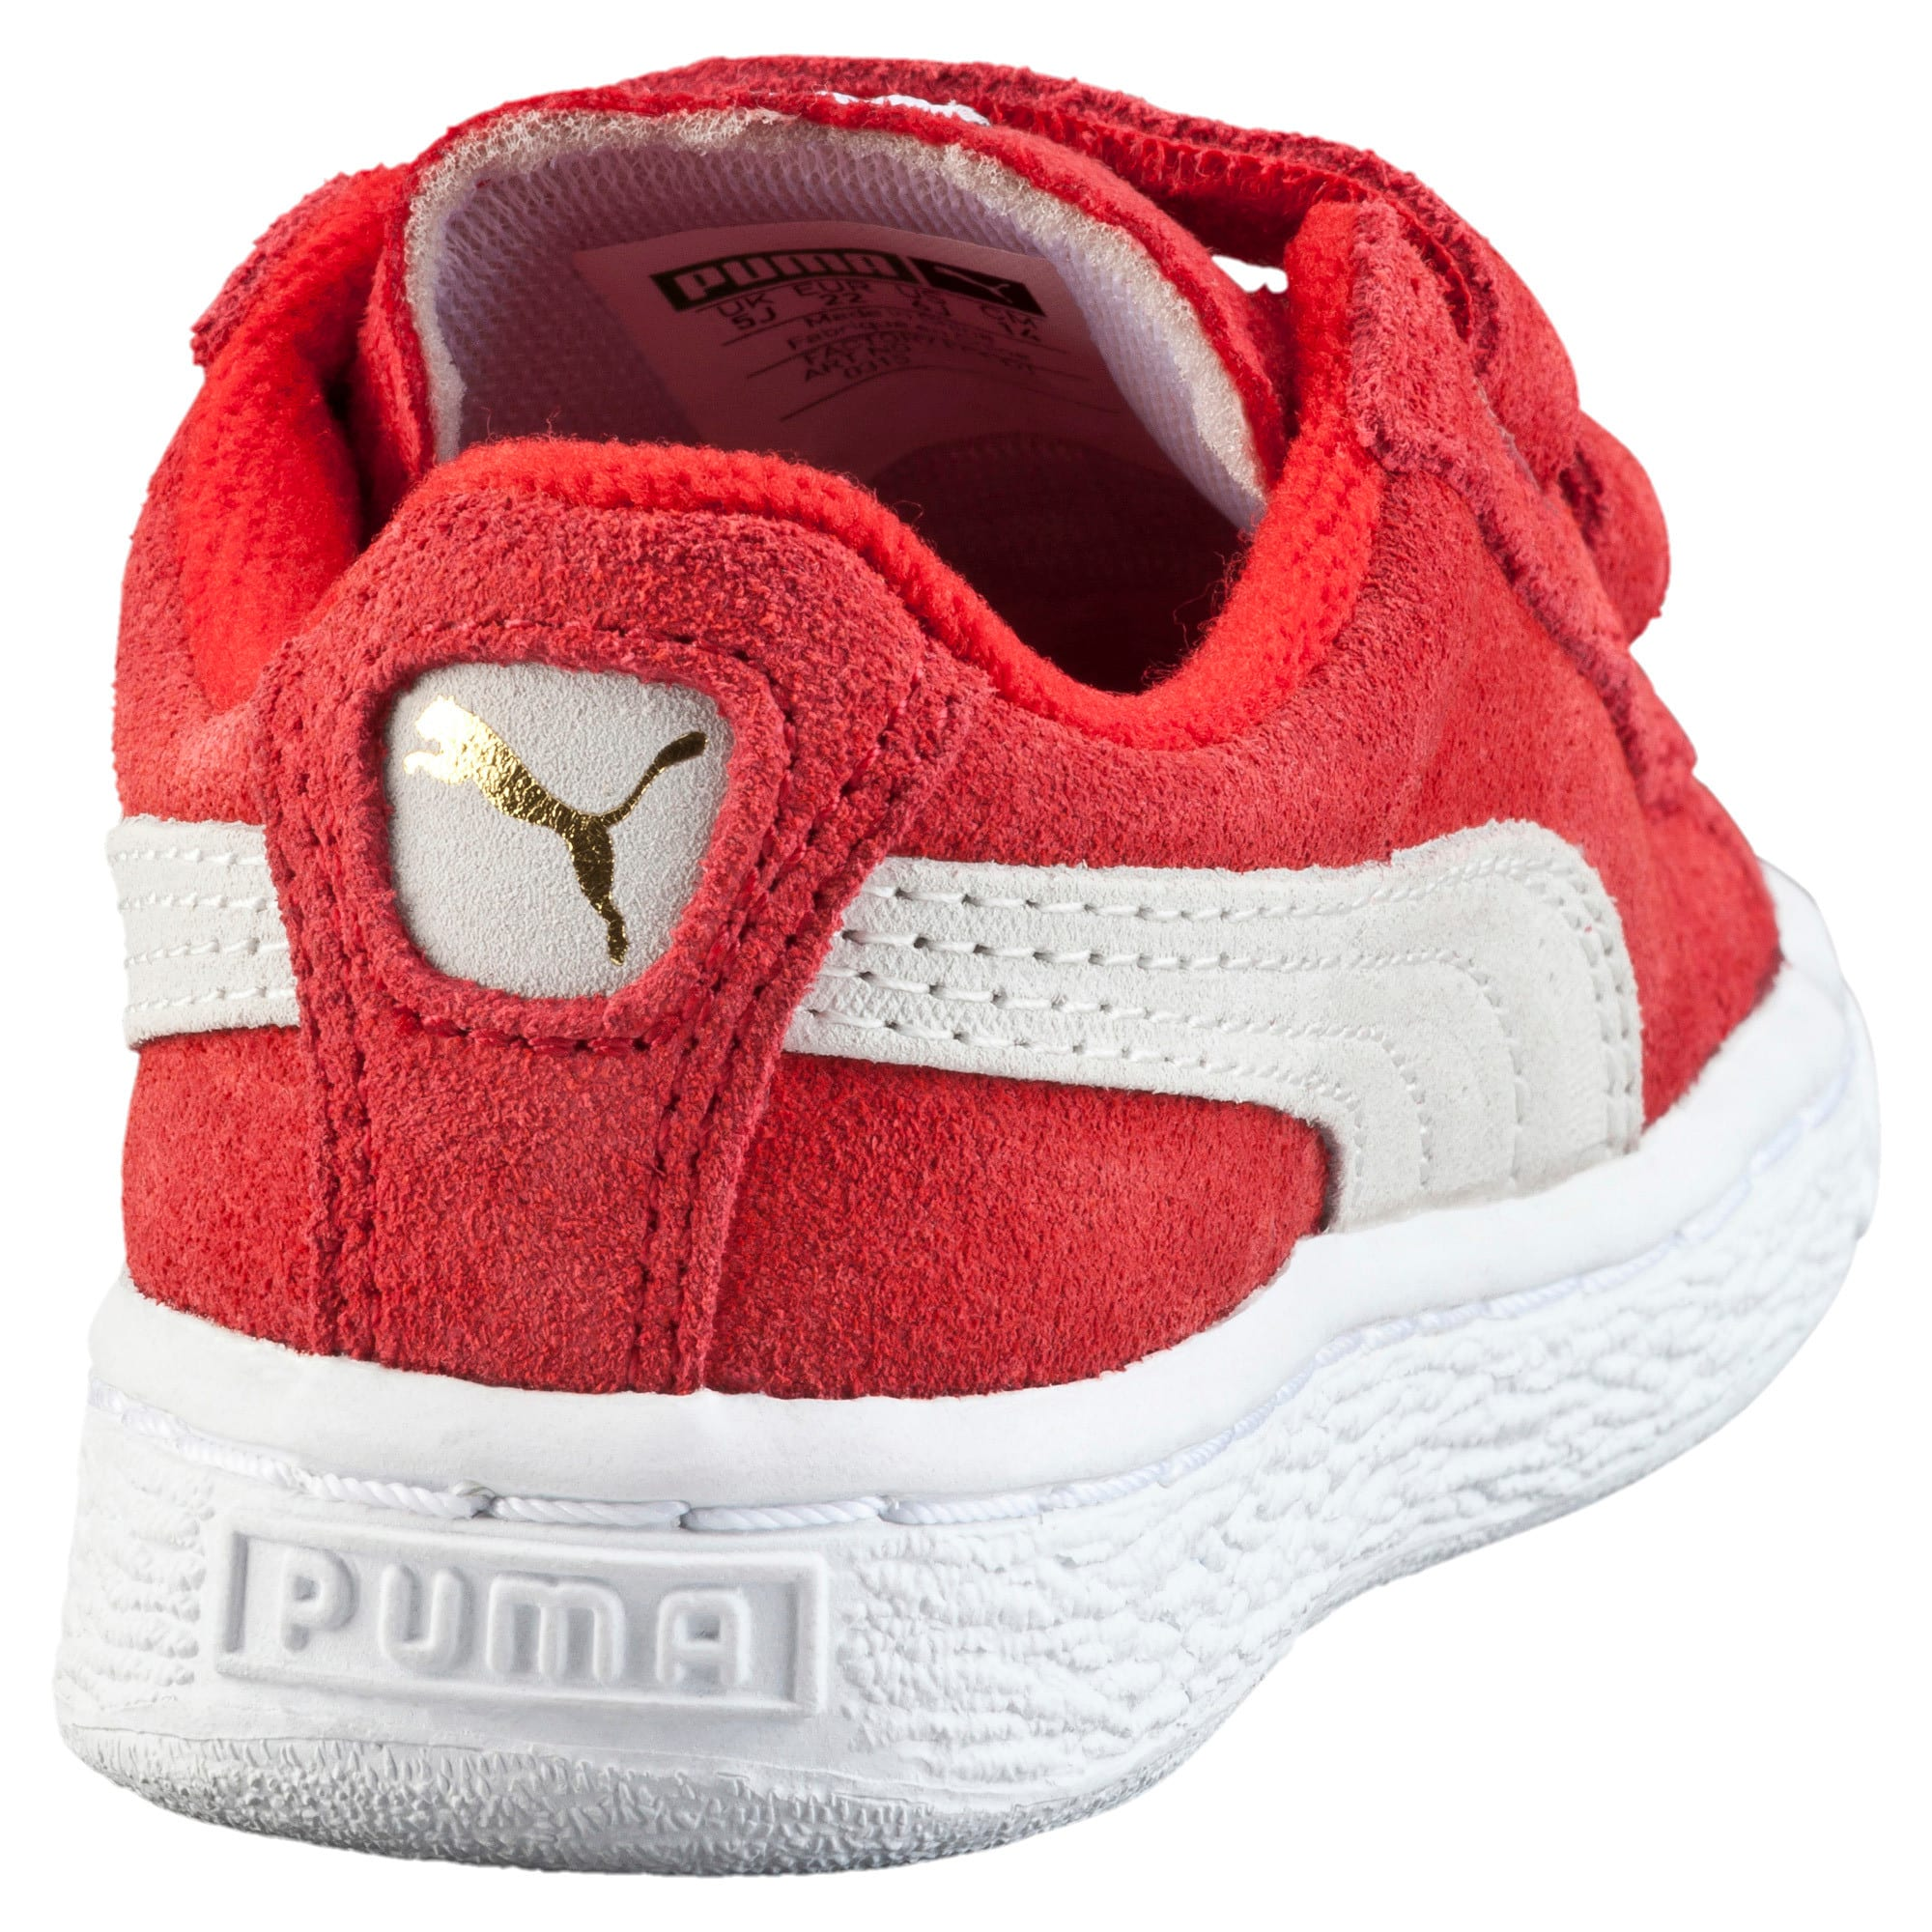 Thumbnail 3 of キッズ スウェード 2ストラップ PS (17-21cm), High Risk Red-Puma White, medium-JPN